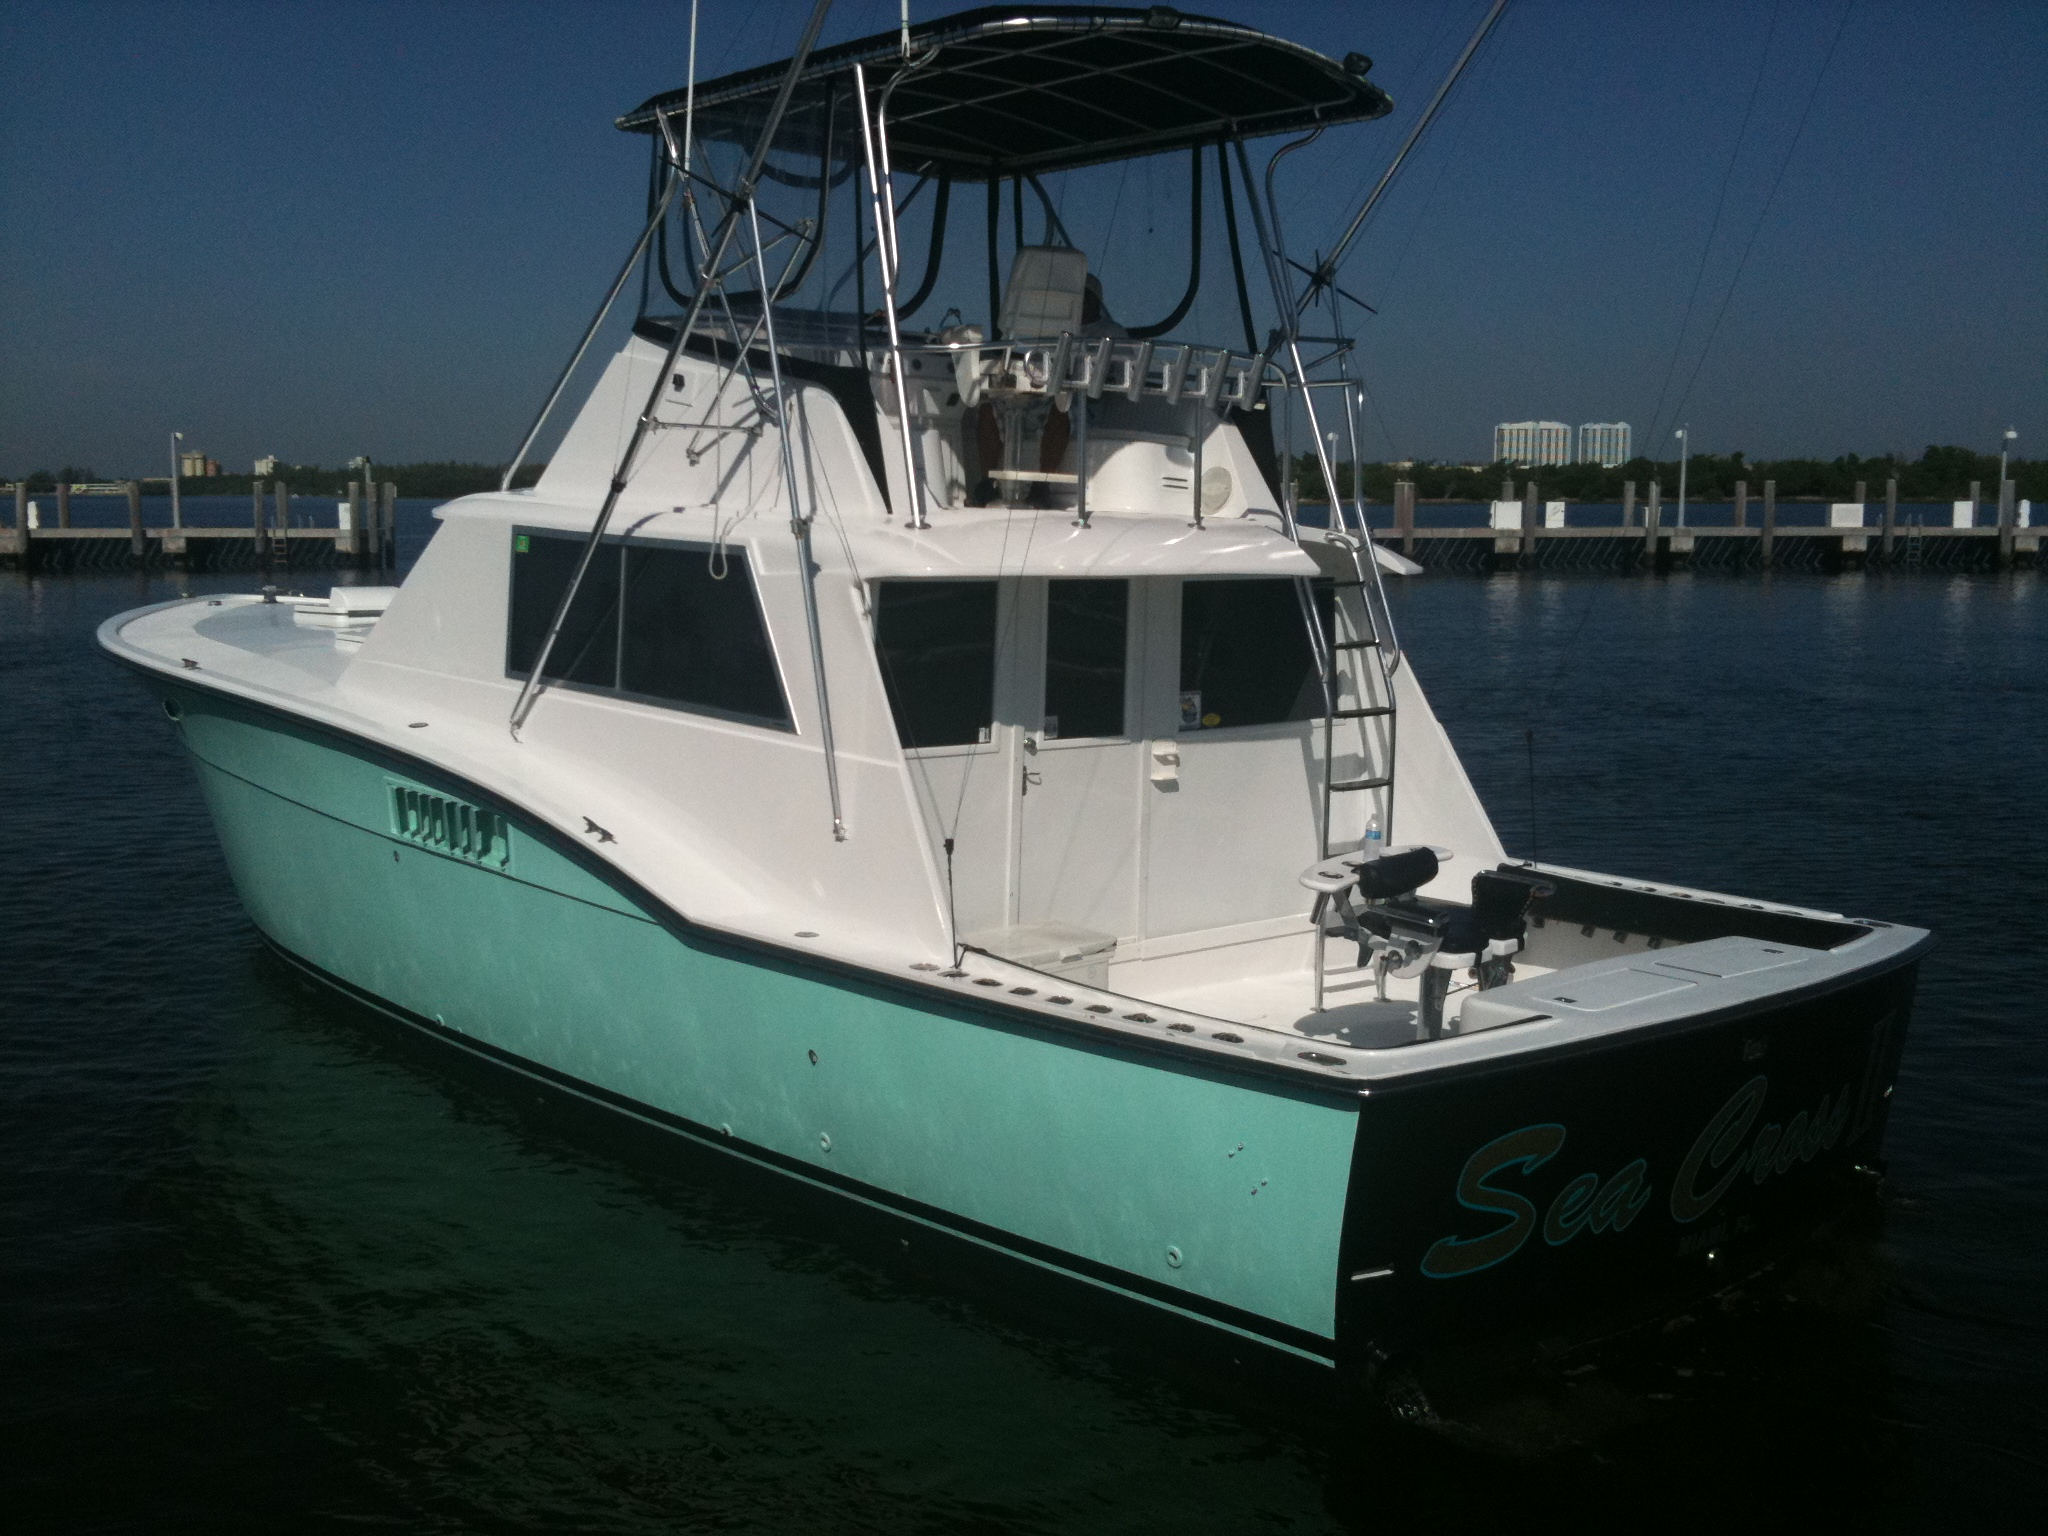 Sea cross deep sea fishing miami in miami beach fl 305 for Deep sea fishing miami